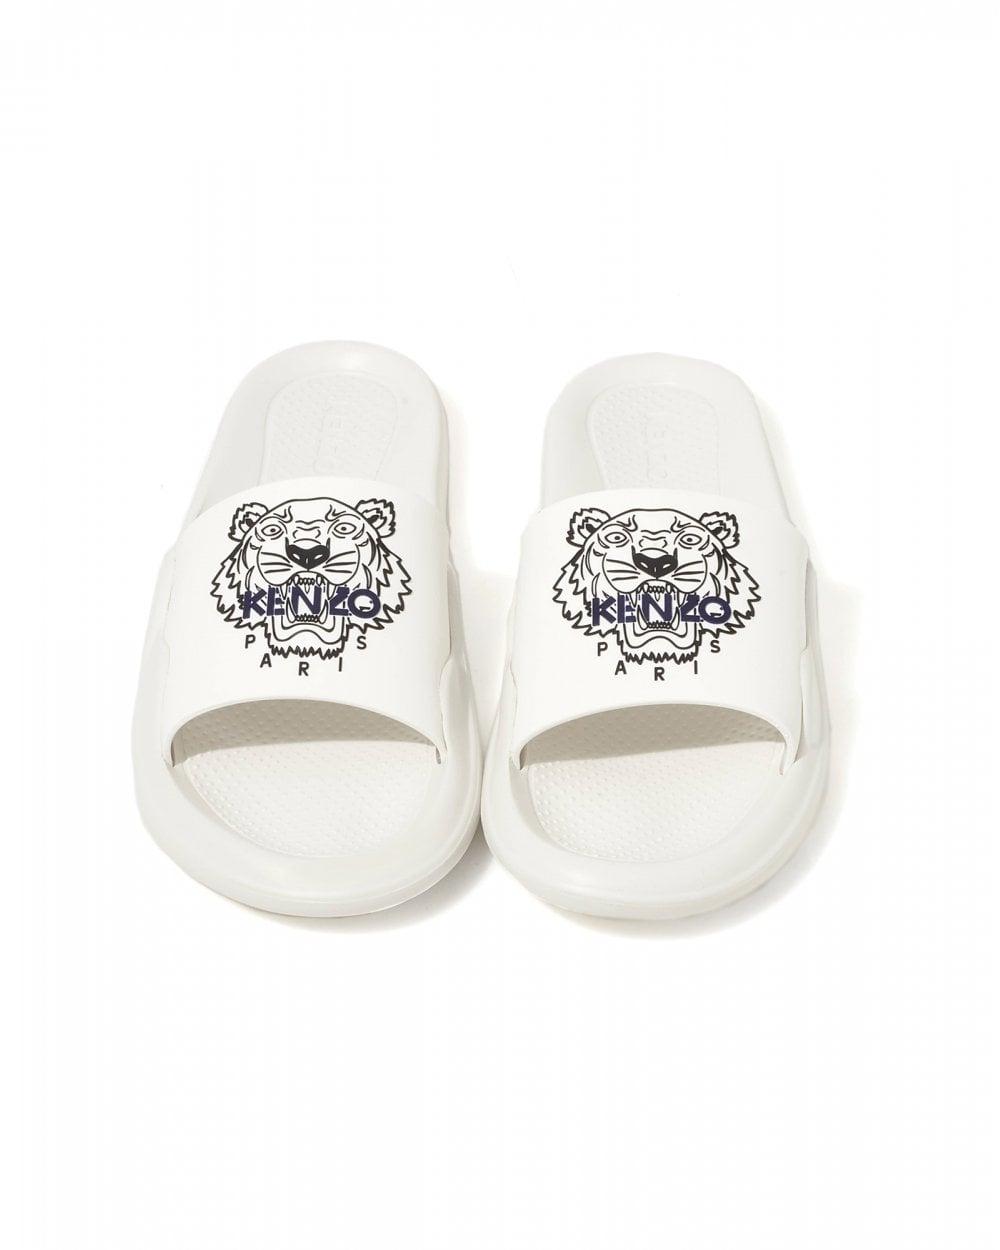 352758100 Mens White Flip Flops, Printed Tiger Slides. BLACK Georgia derby shoes for  unisex KENZO .